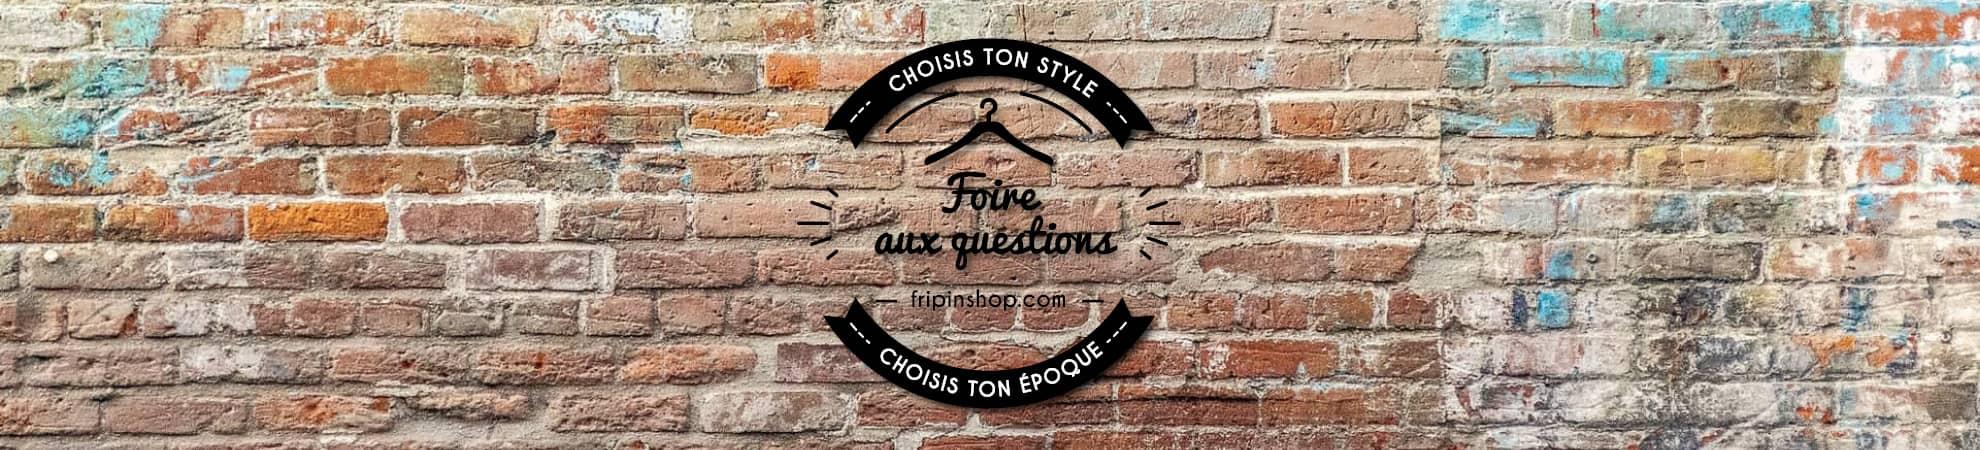 header-frip-in-shop-foire-aux-questions-faqs